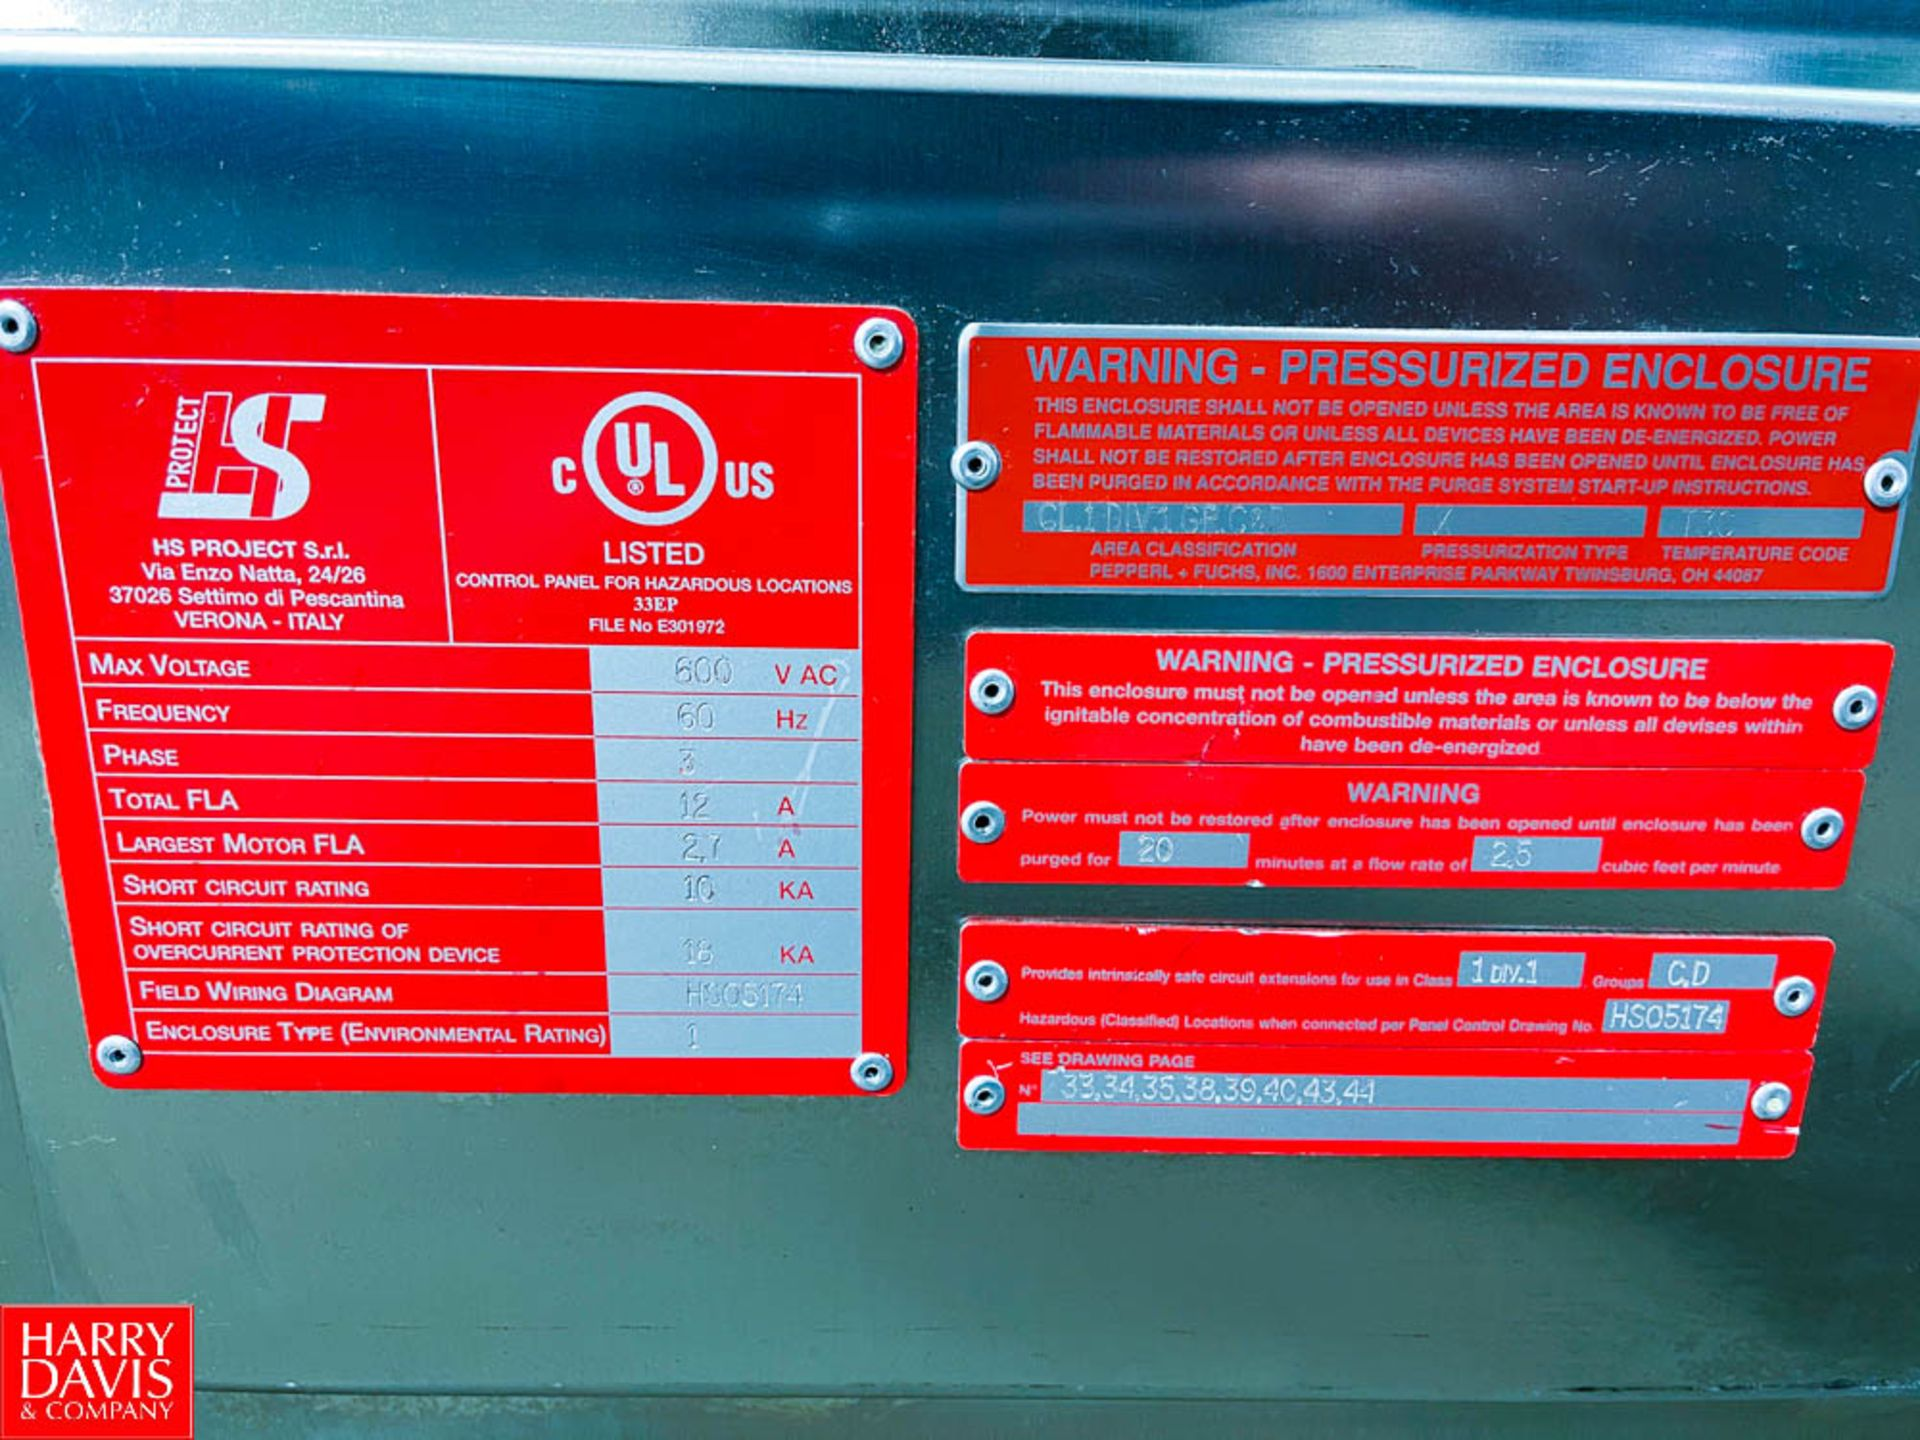 Pressurized 2-Door S/S Portable Control Panel - Image 6 of 7